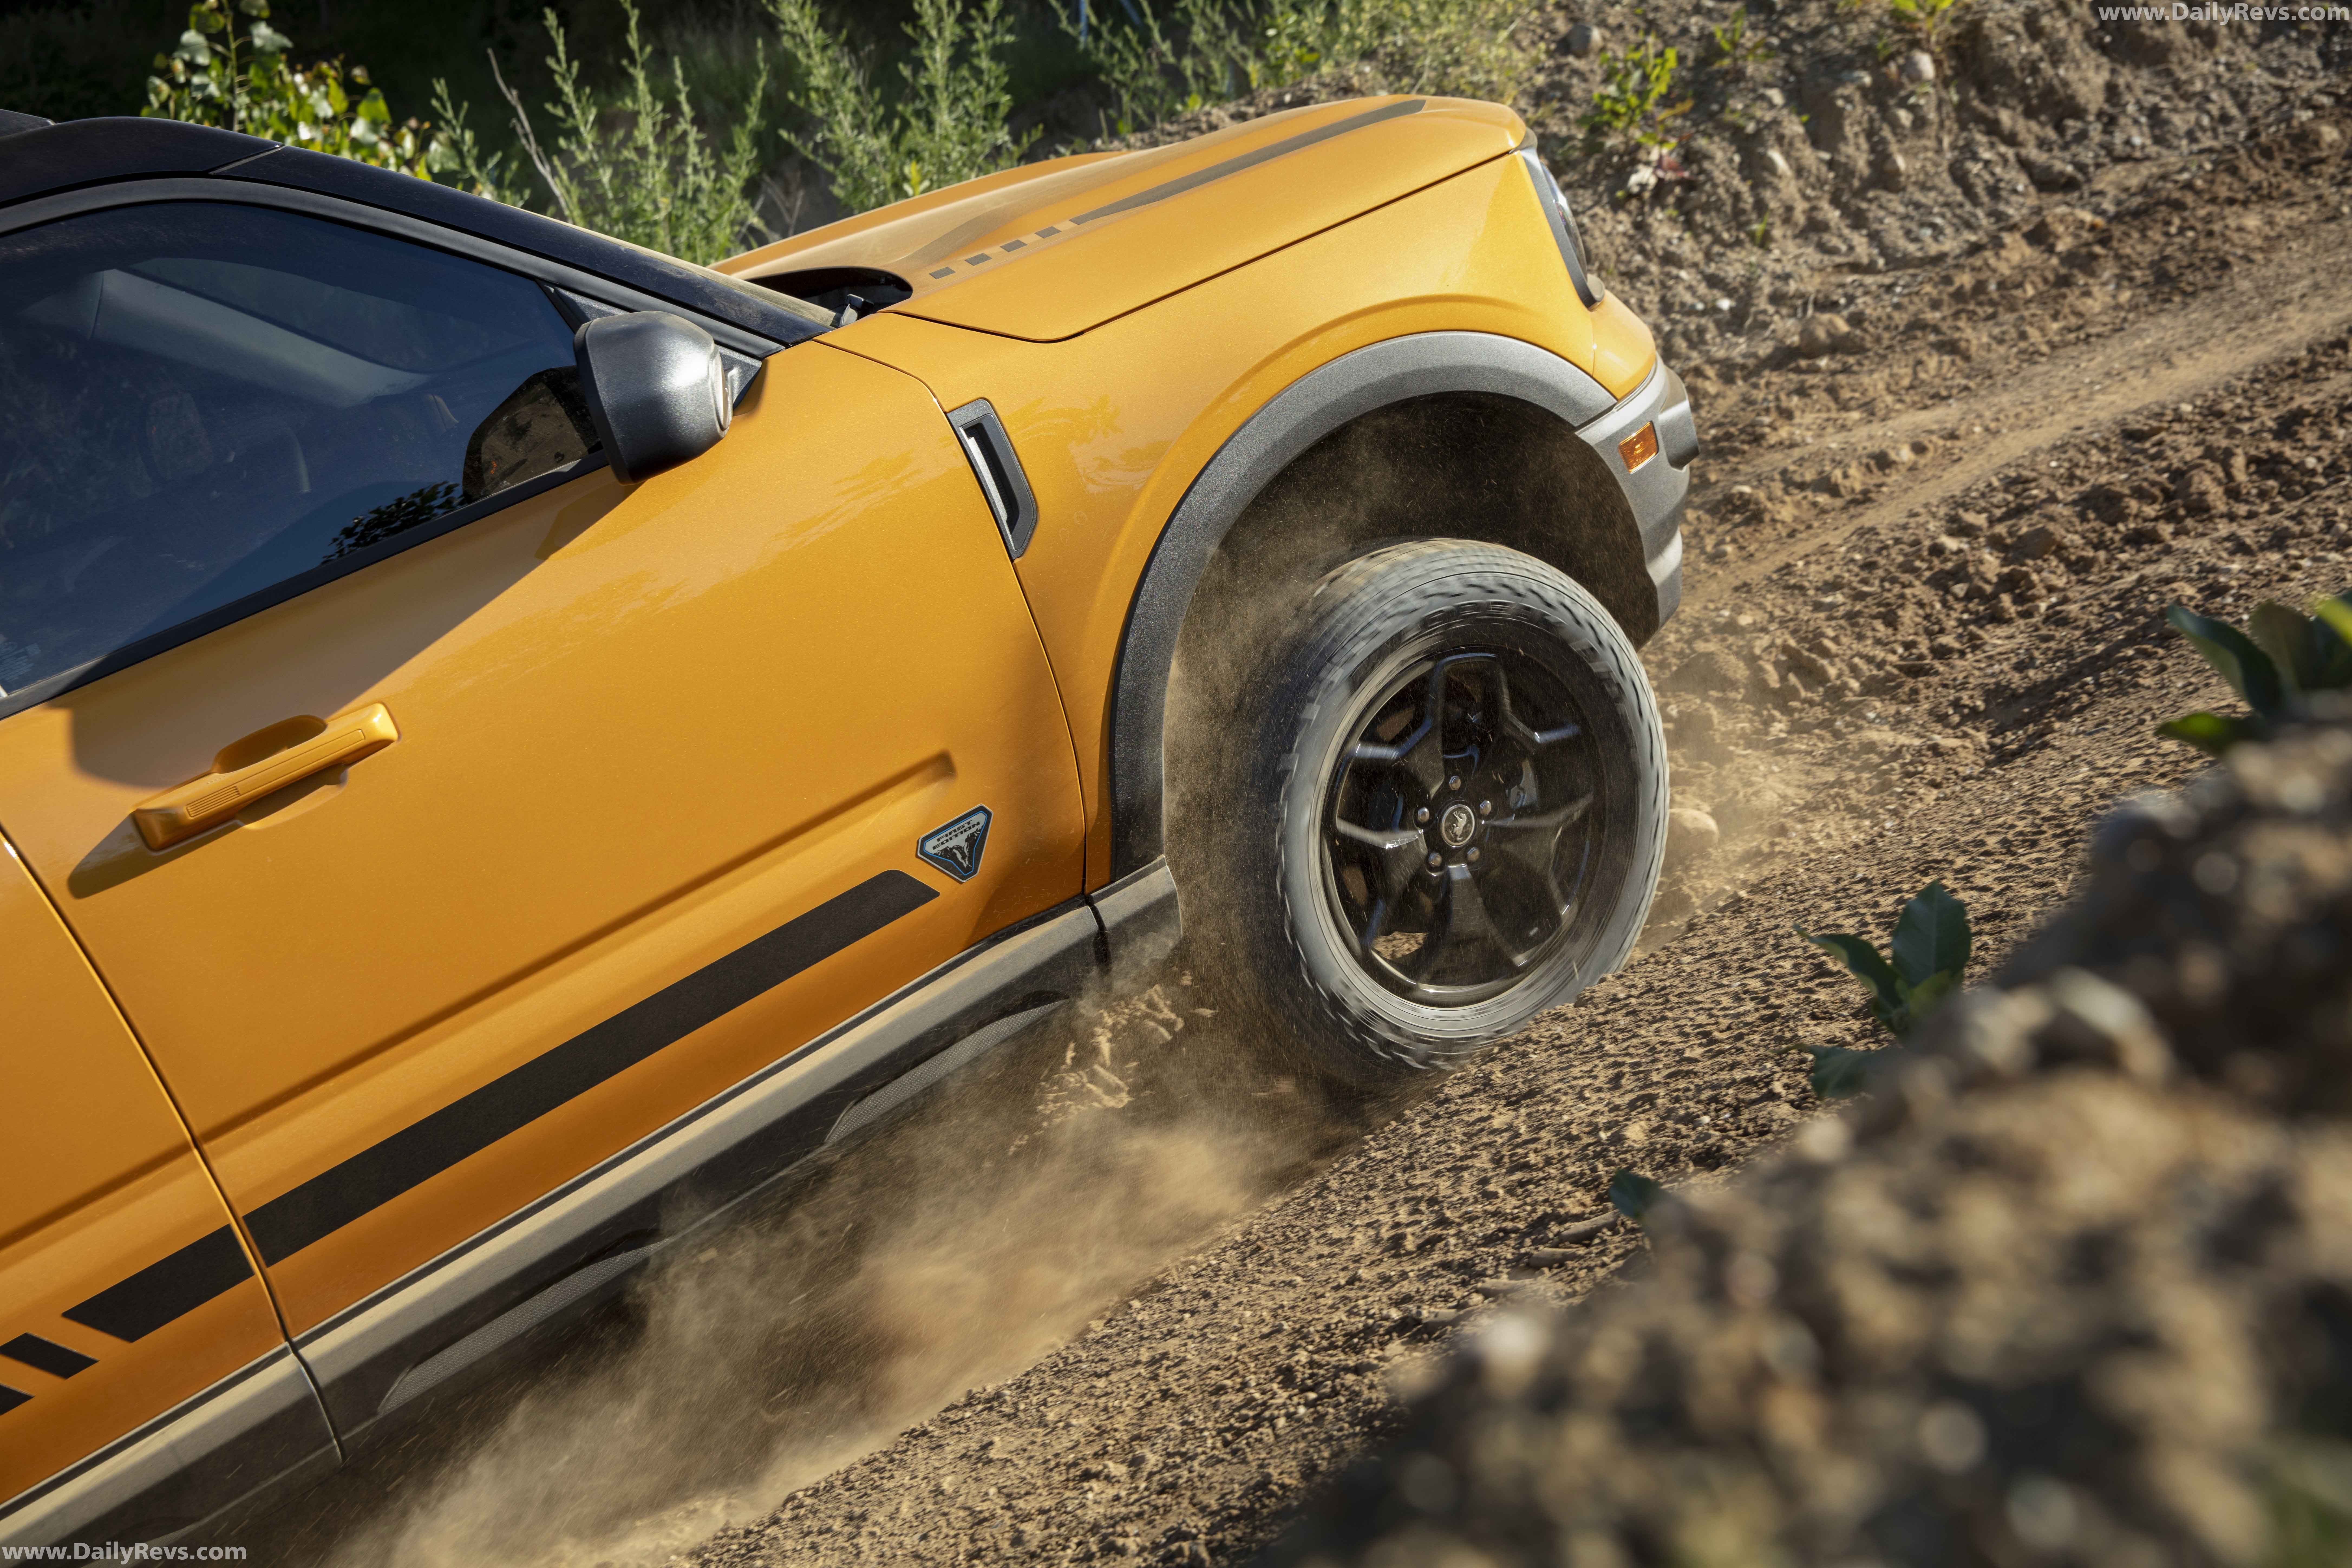 2021 Ford Bronco Sport Dailyrevs in 2020 Bronco sports